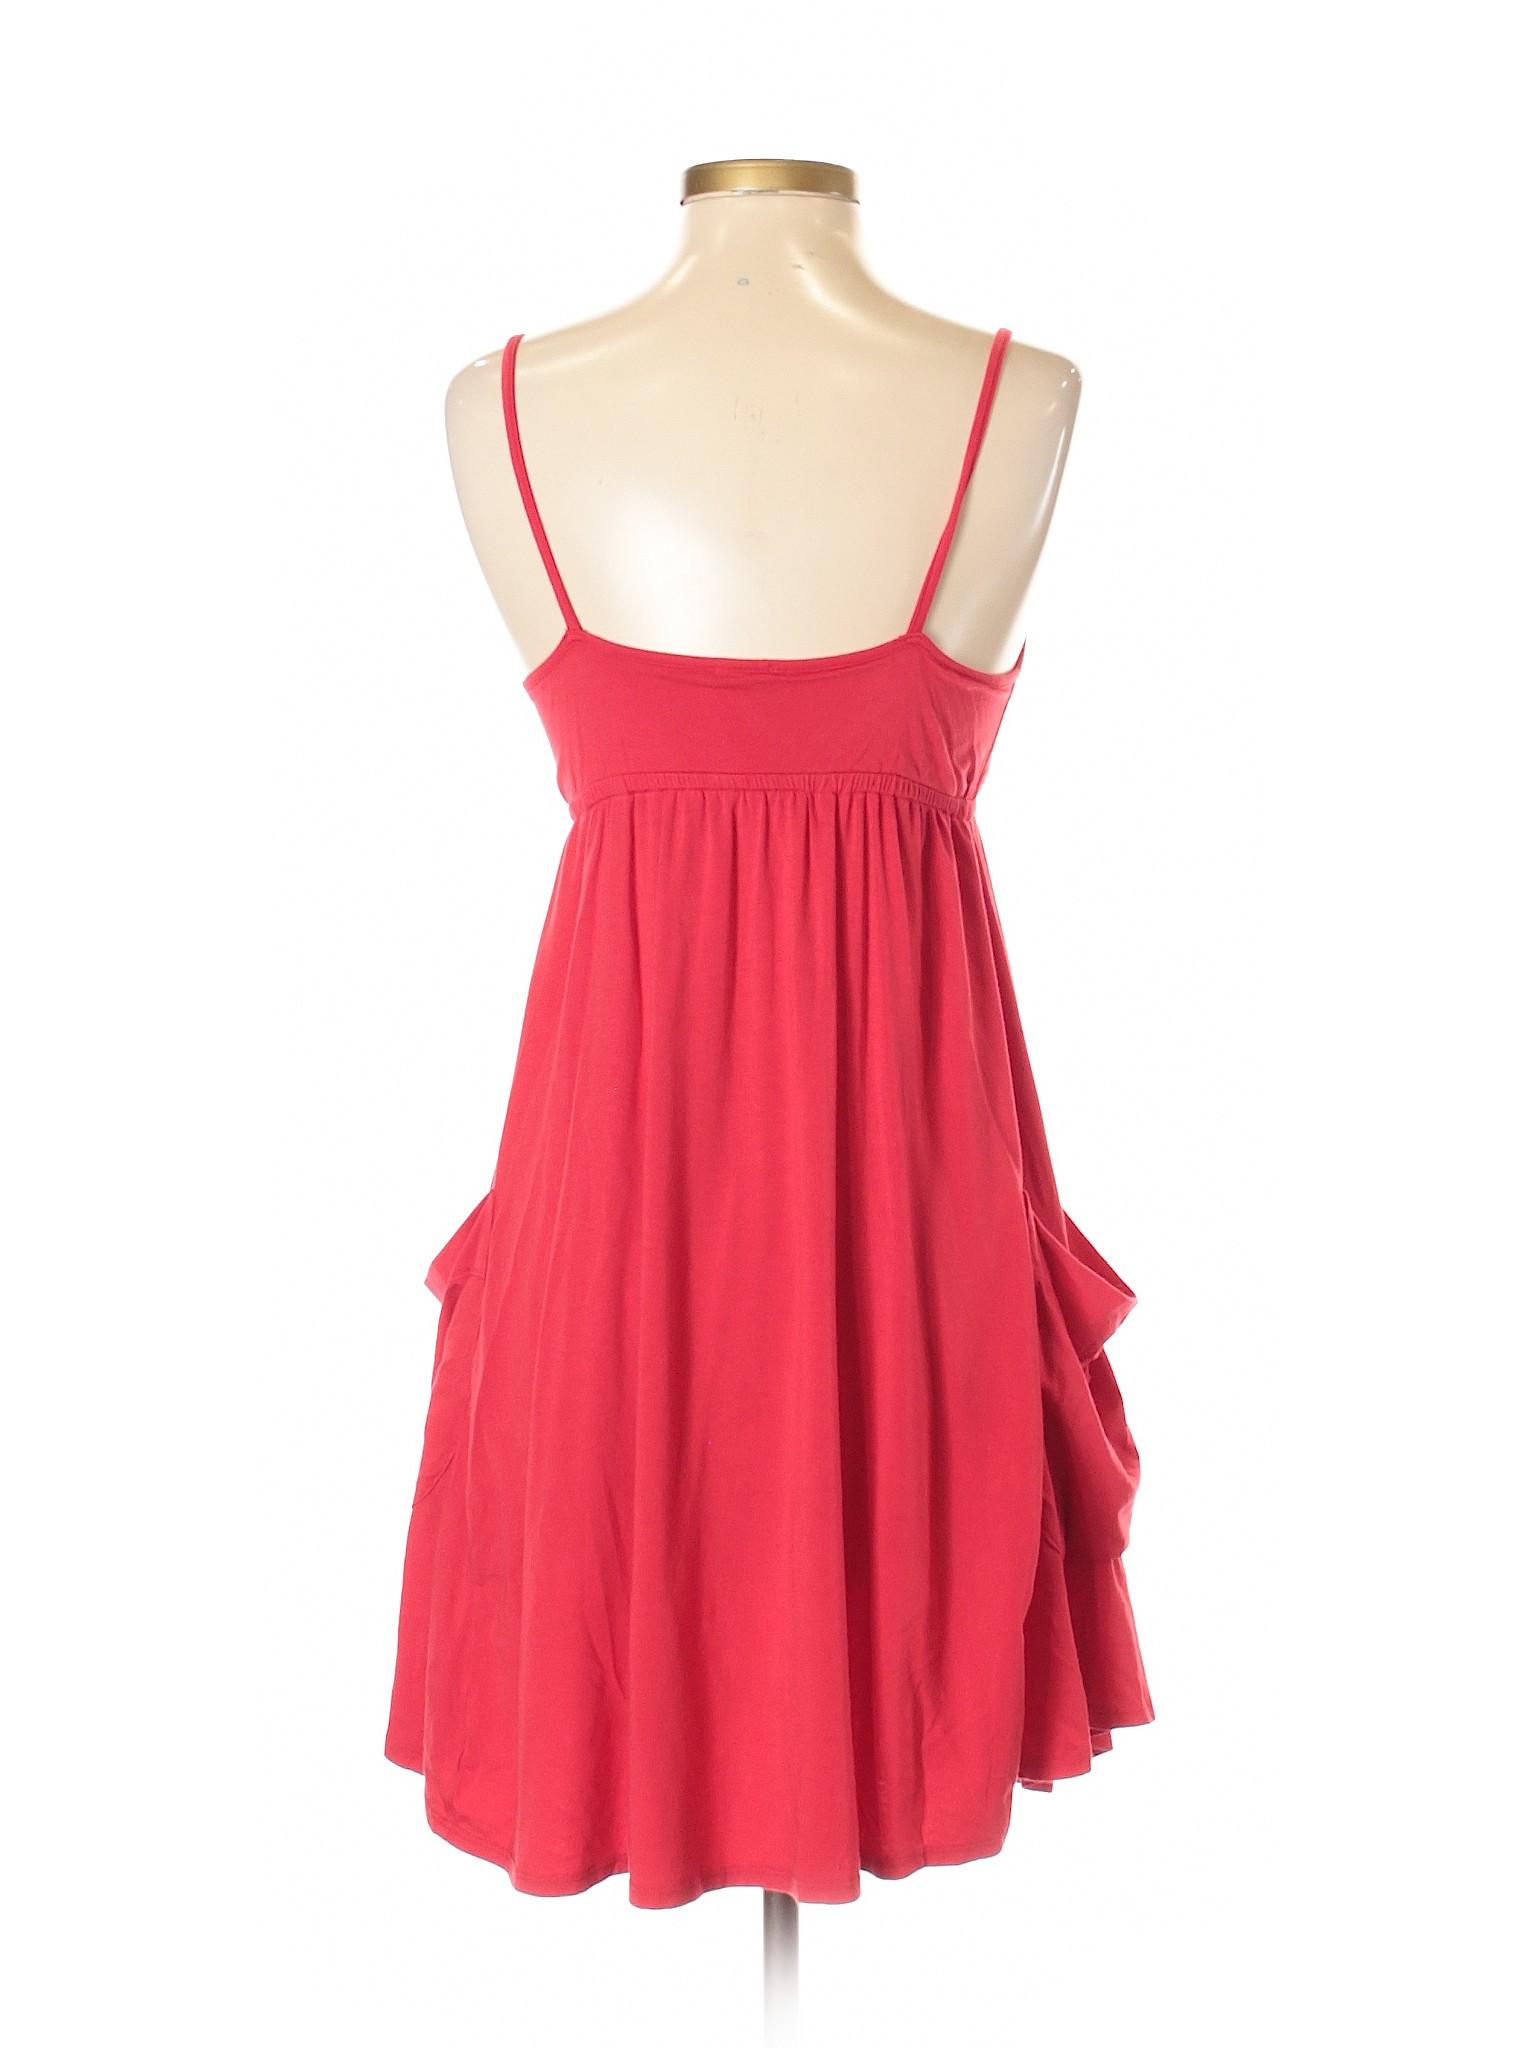 Selling Splendid Dress Splendid Selling Casual raqIFCrw